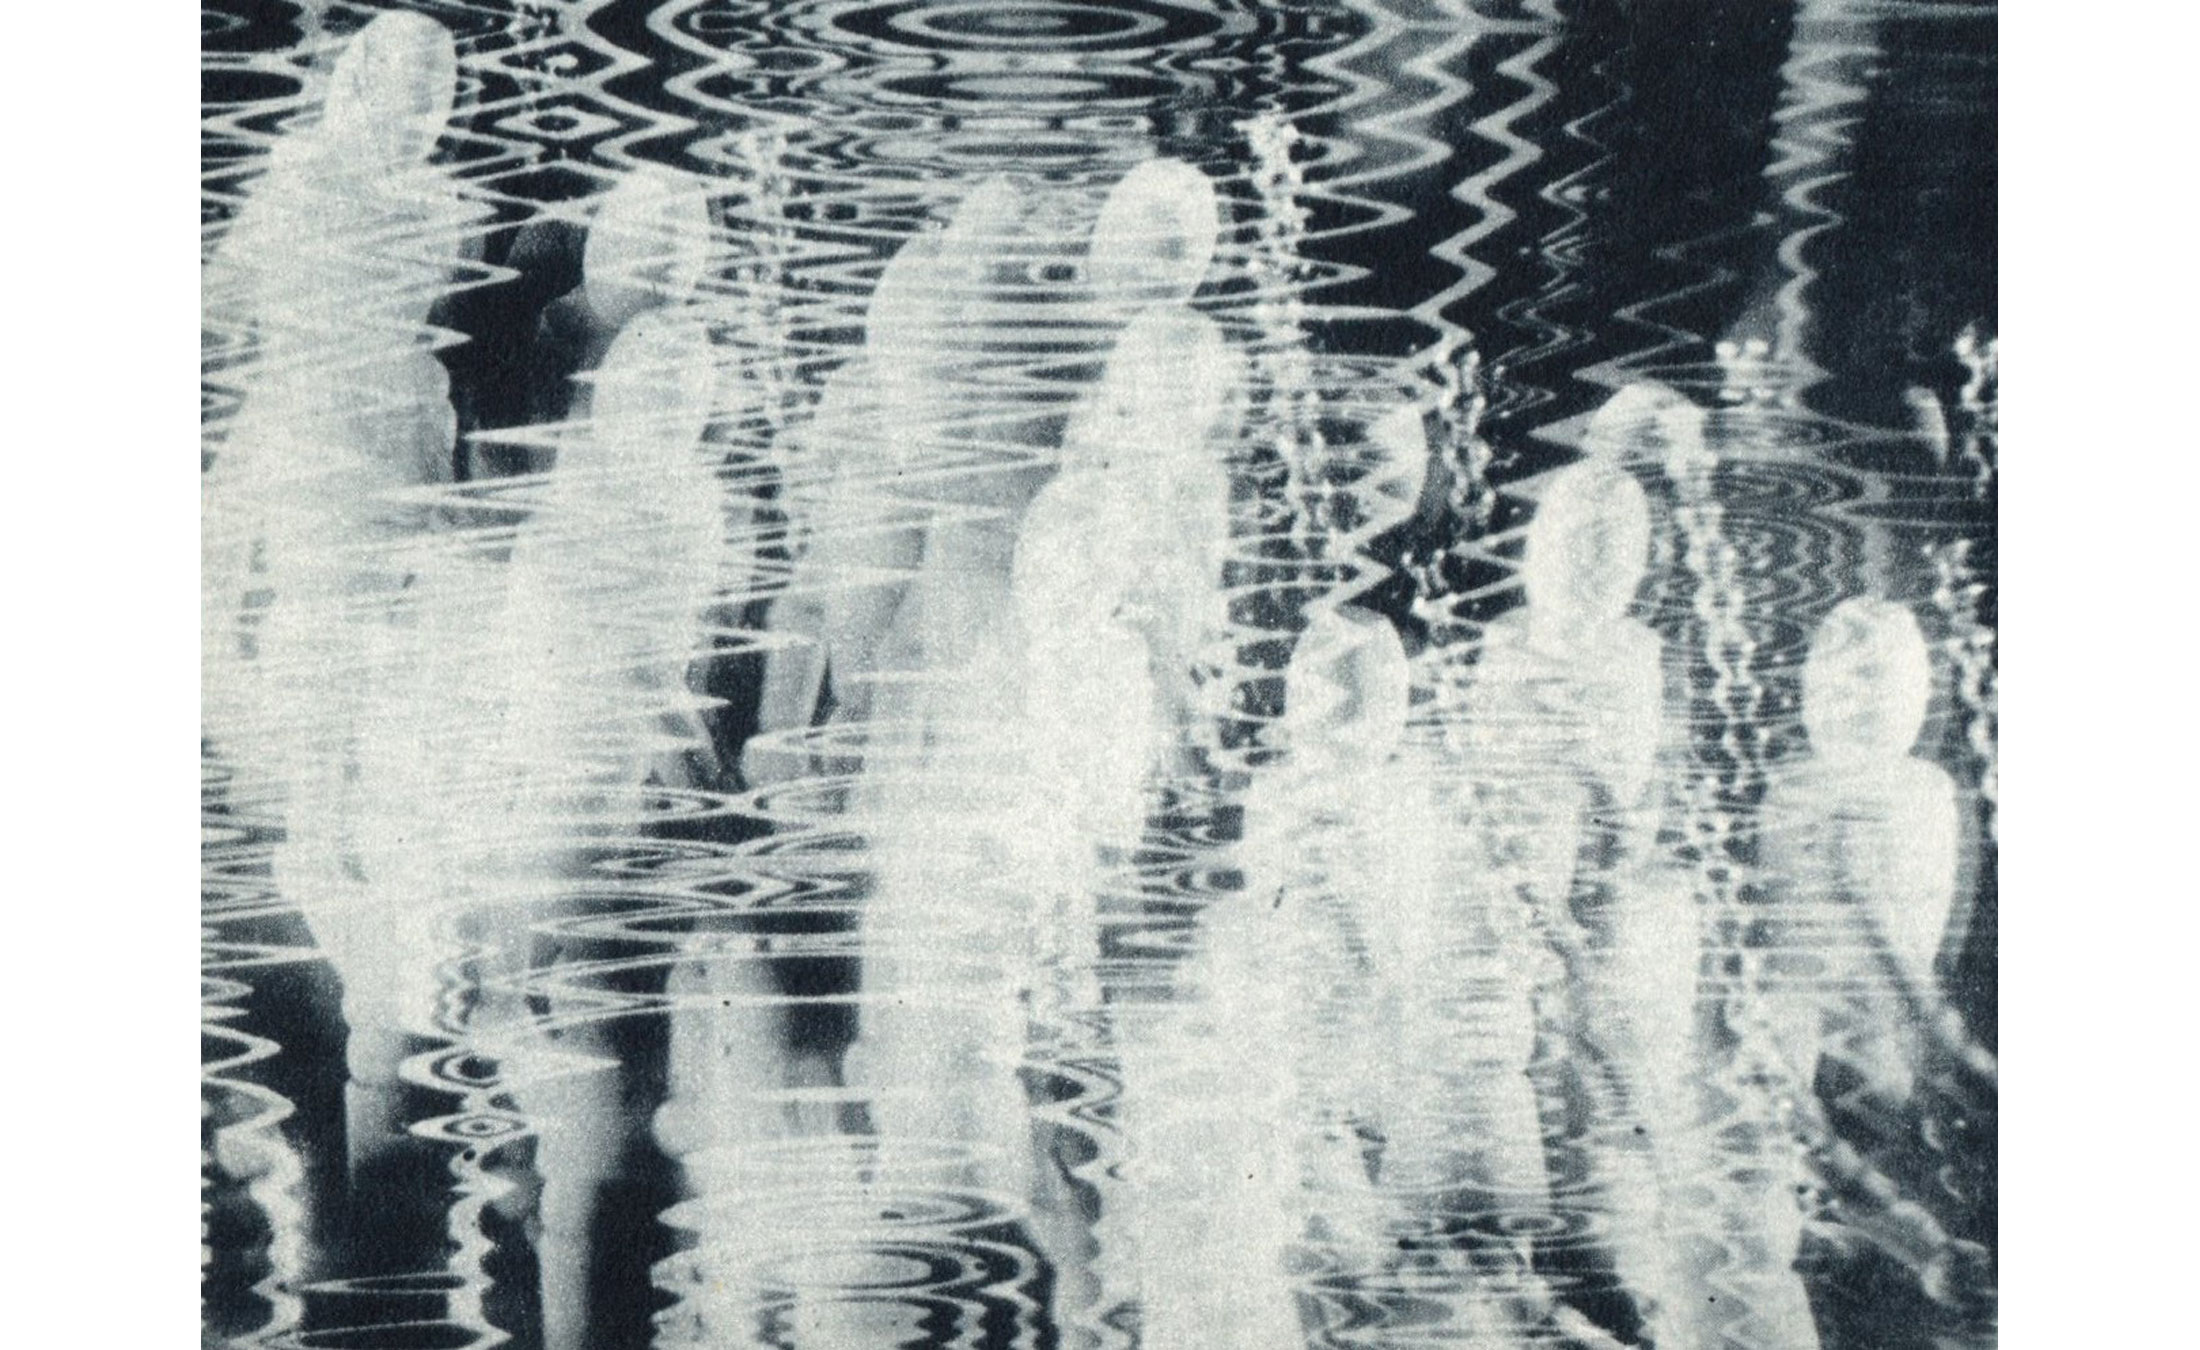 Raymond-Hains-graphisme-et-photographie-magazine-prisma-5-photographie-hypnagogique-02